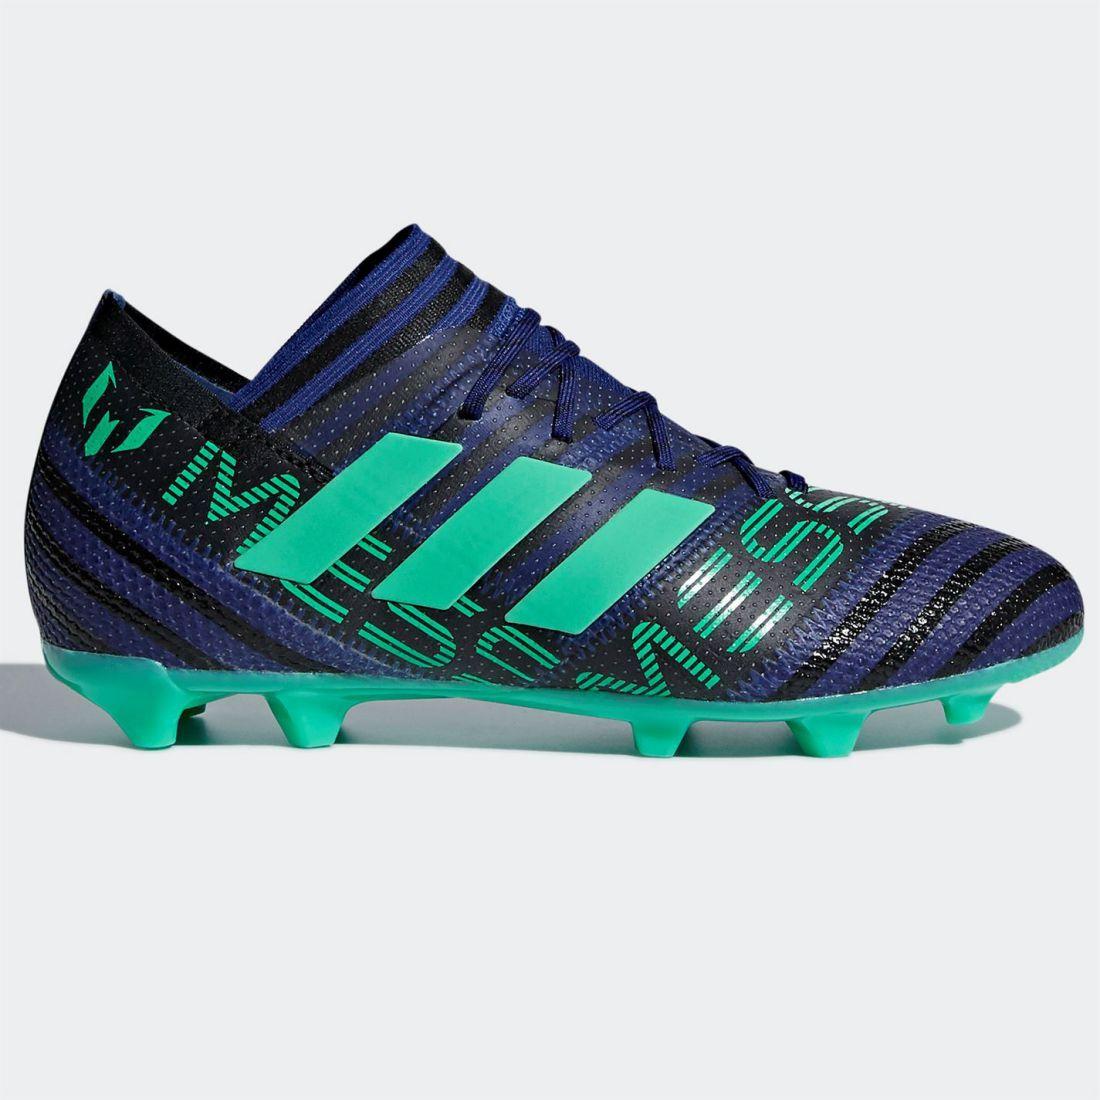 8042cb664 adidas Nemeziz Messi 17.1 Childrens FG Football Boots Firm Ground ...